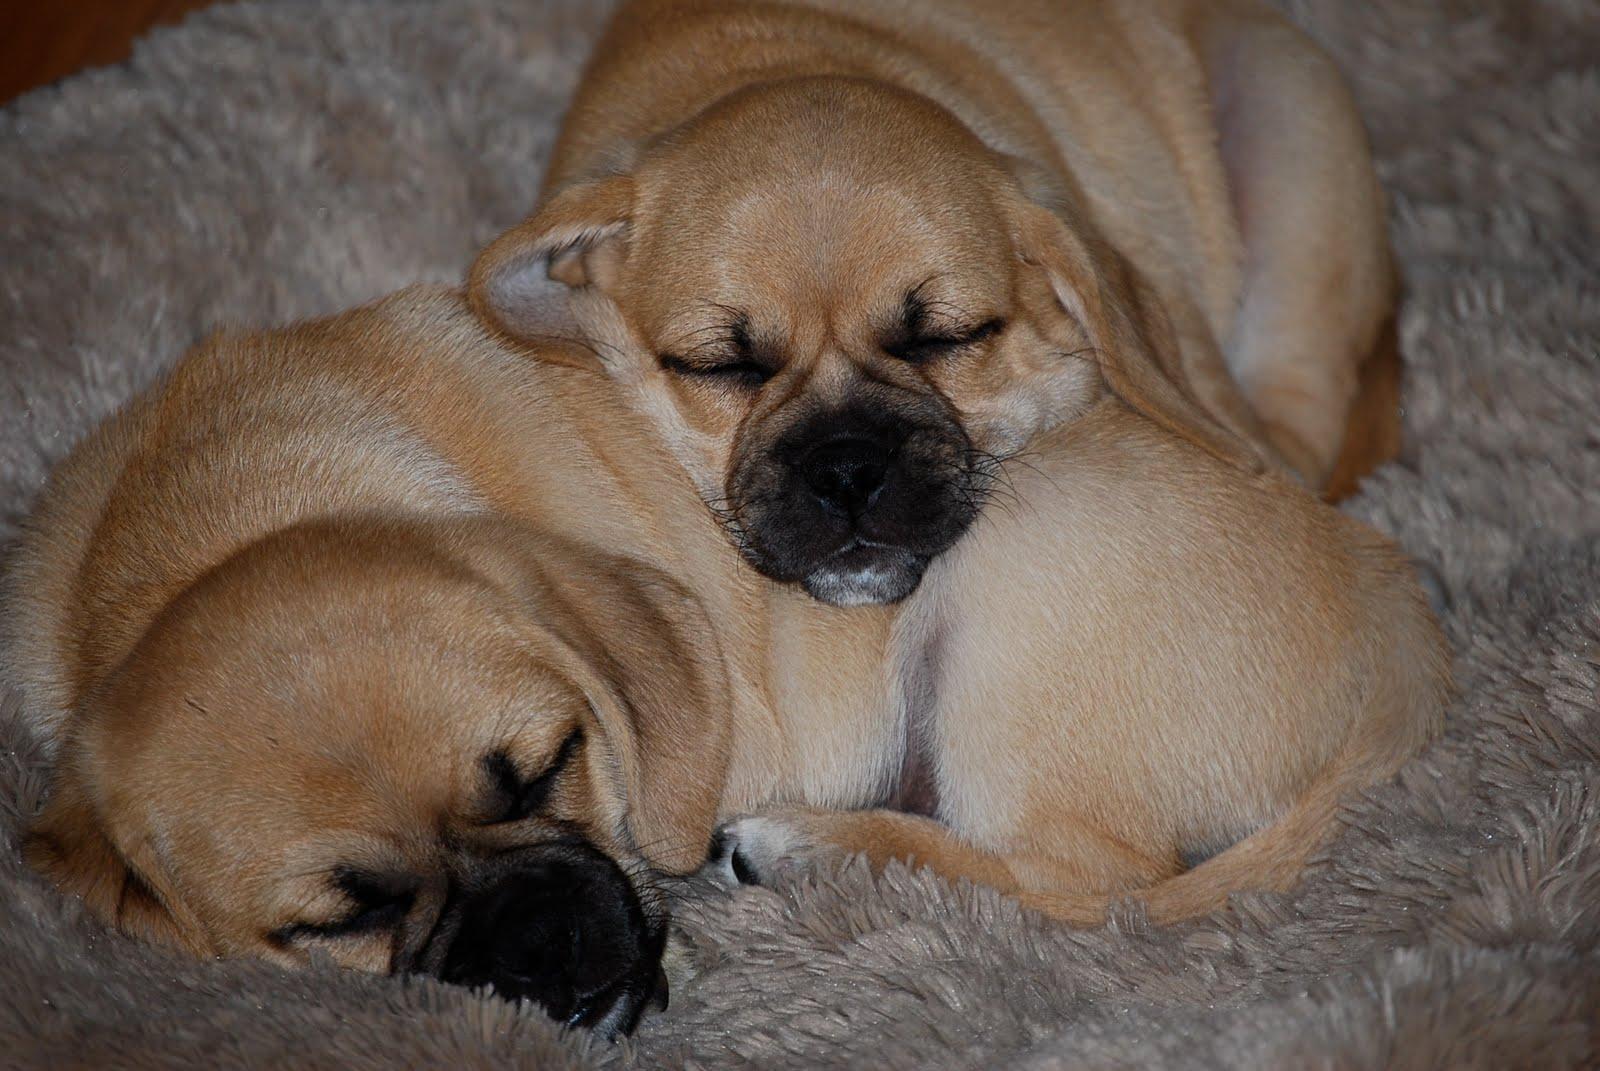 Snuggle Puggles